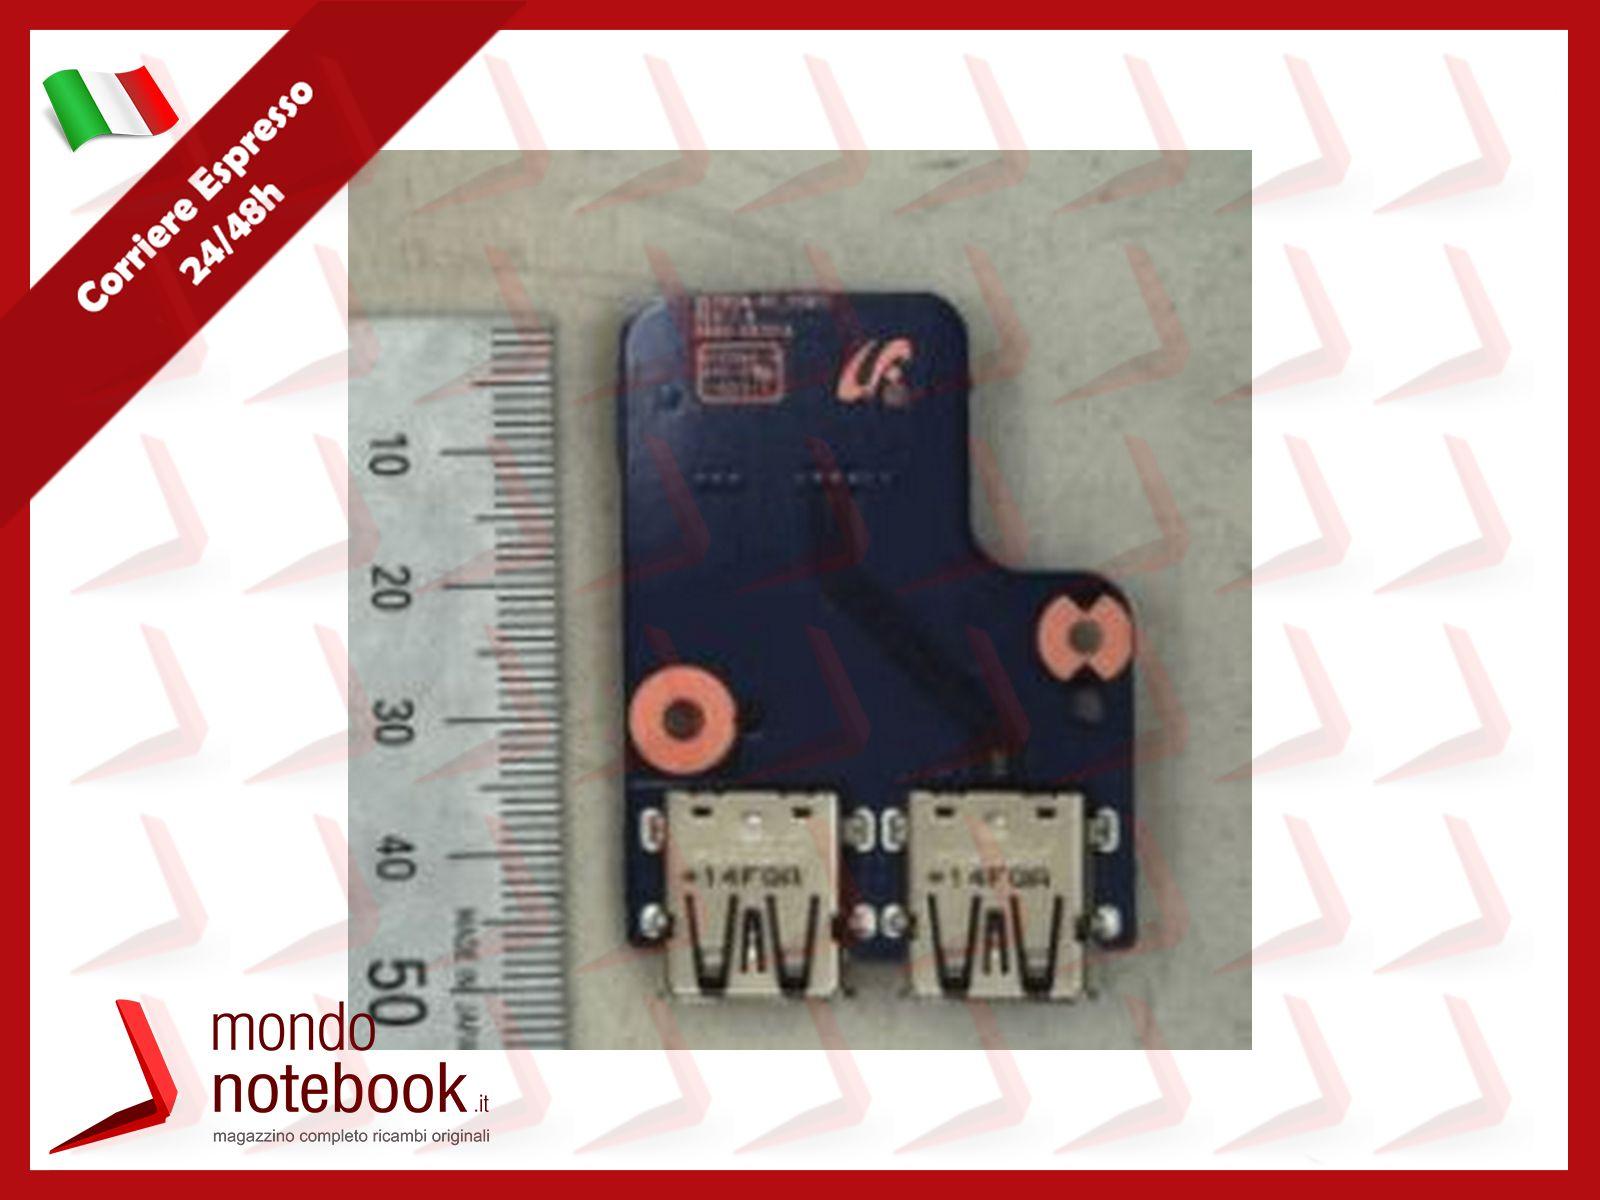 https://www.mondonotebook.it/11682/cerniere-hinges-hp-probook-650-g1-coppia.jpg